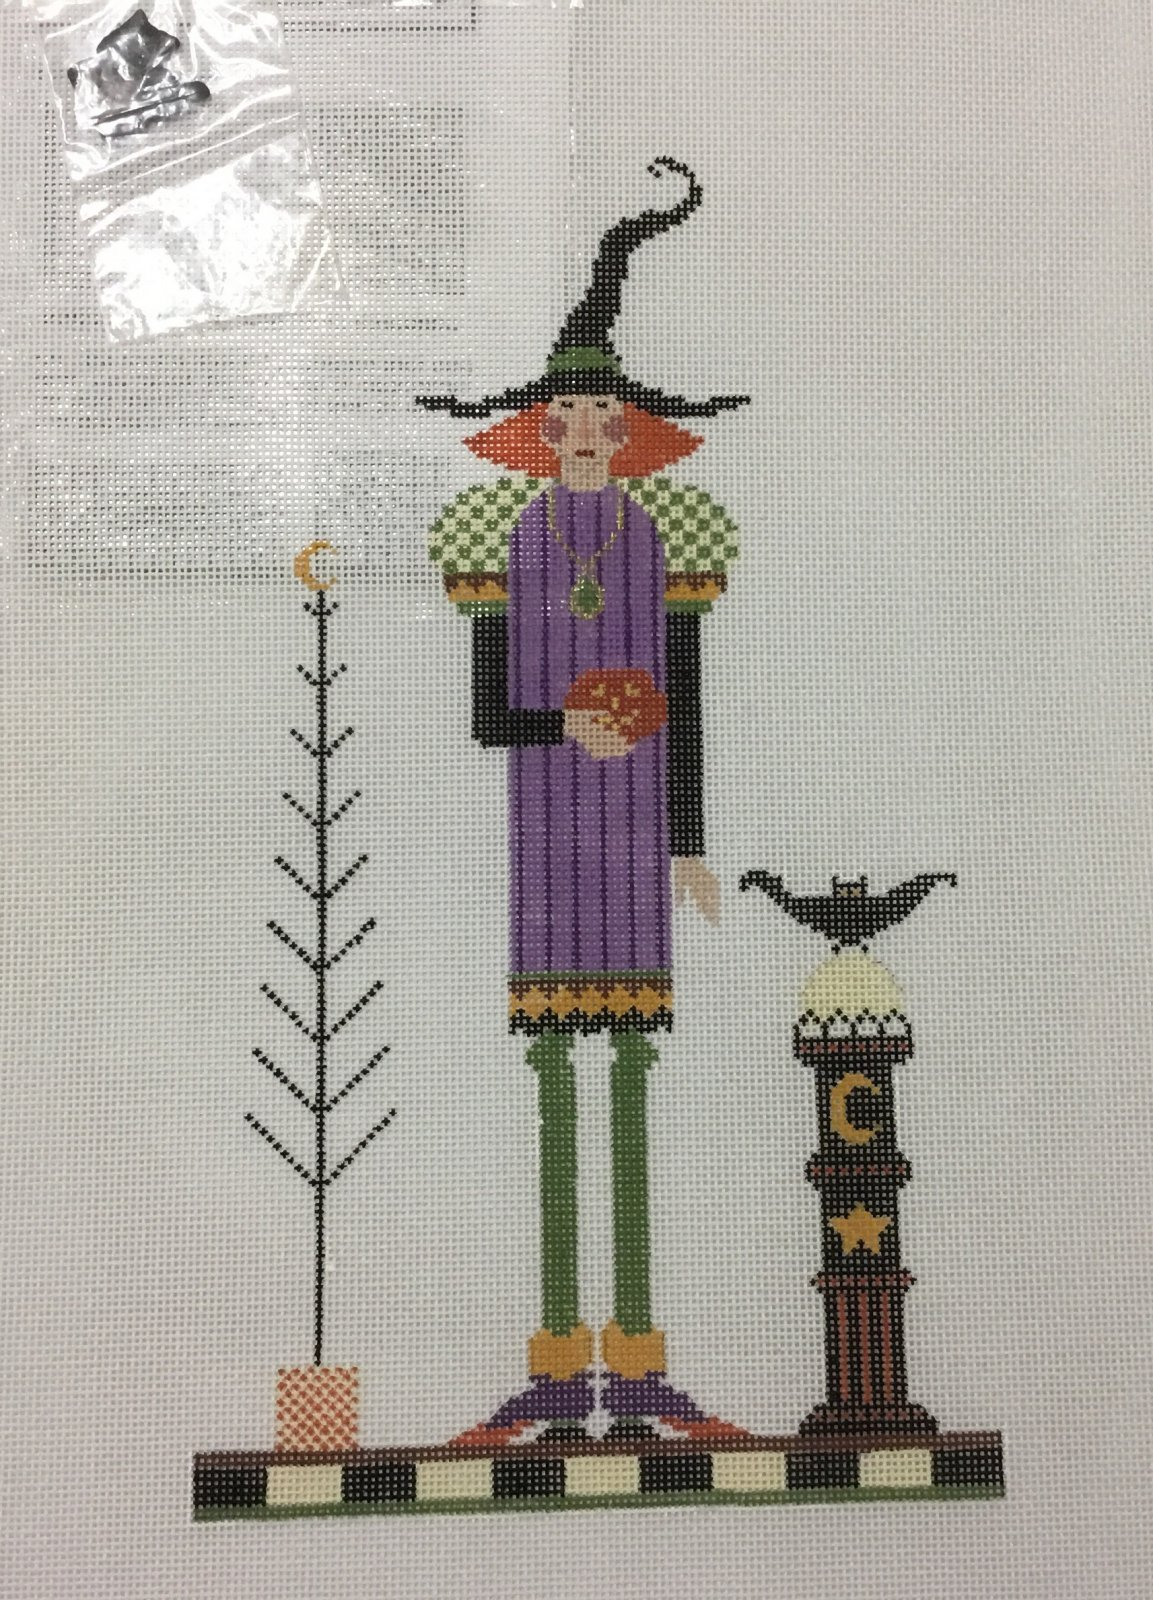 Brenna Witch, 18M, 6.25x11